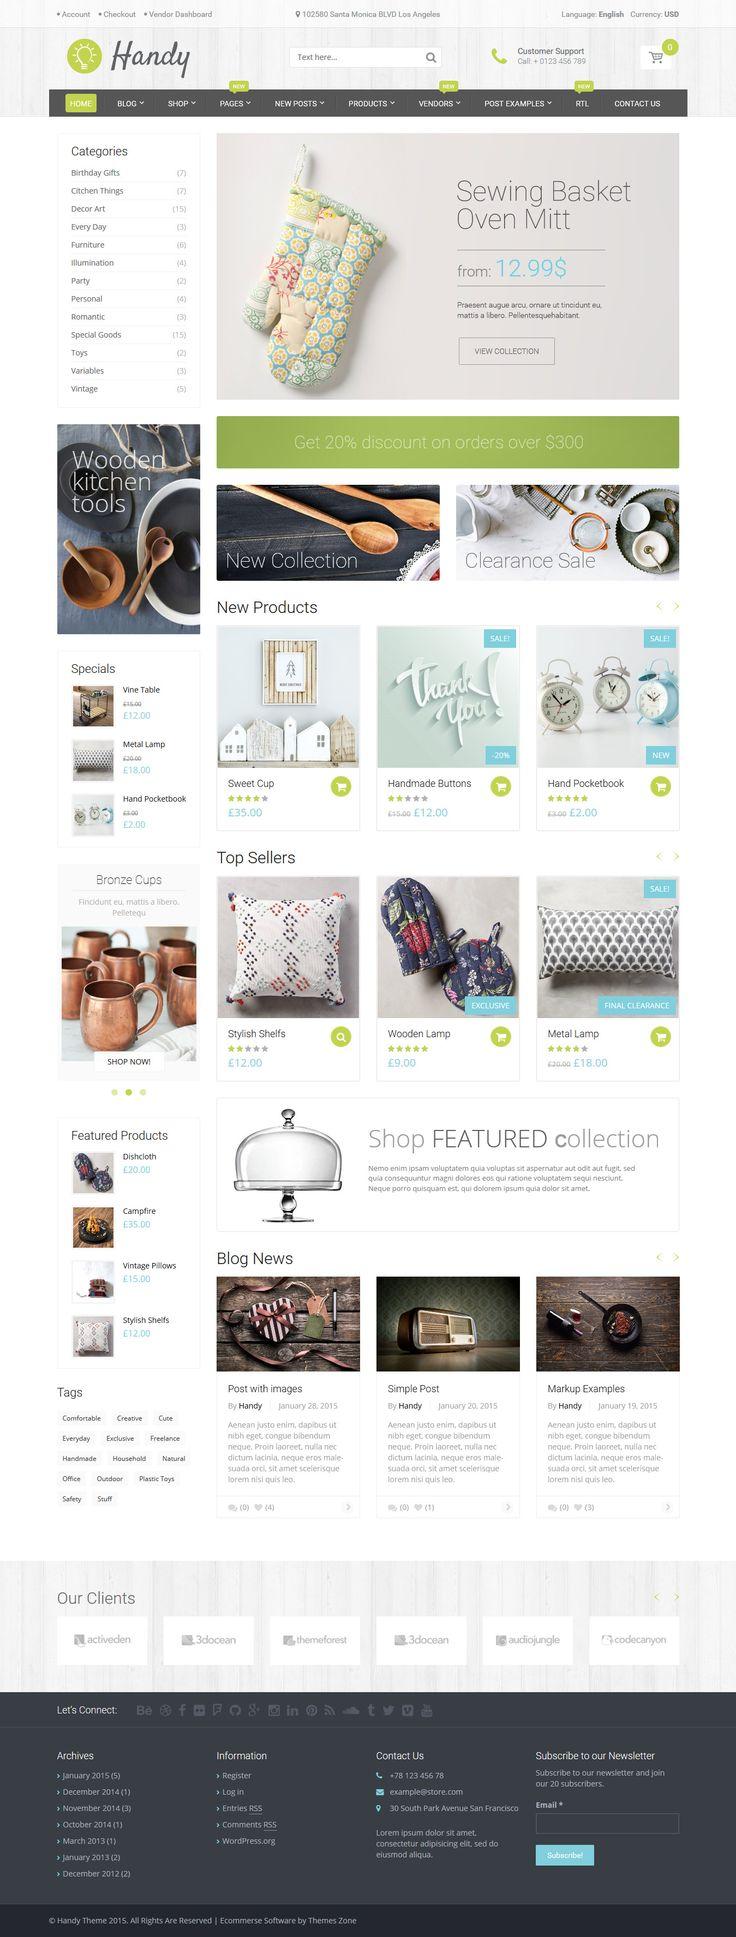 Handy - Handmade Shop WordPress WooCommerce Theme #shoptheme #wordpress #woocommerce Live Demo & Download: http://graphicbattle.blogspot.com/2015/05/10-new-woocommerce-theme-wordpress.html